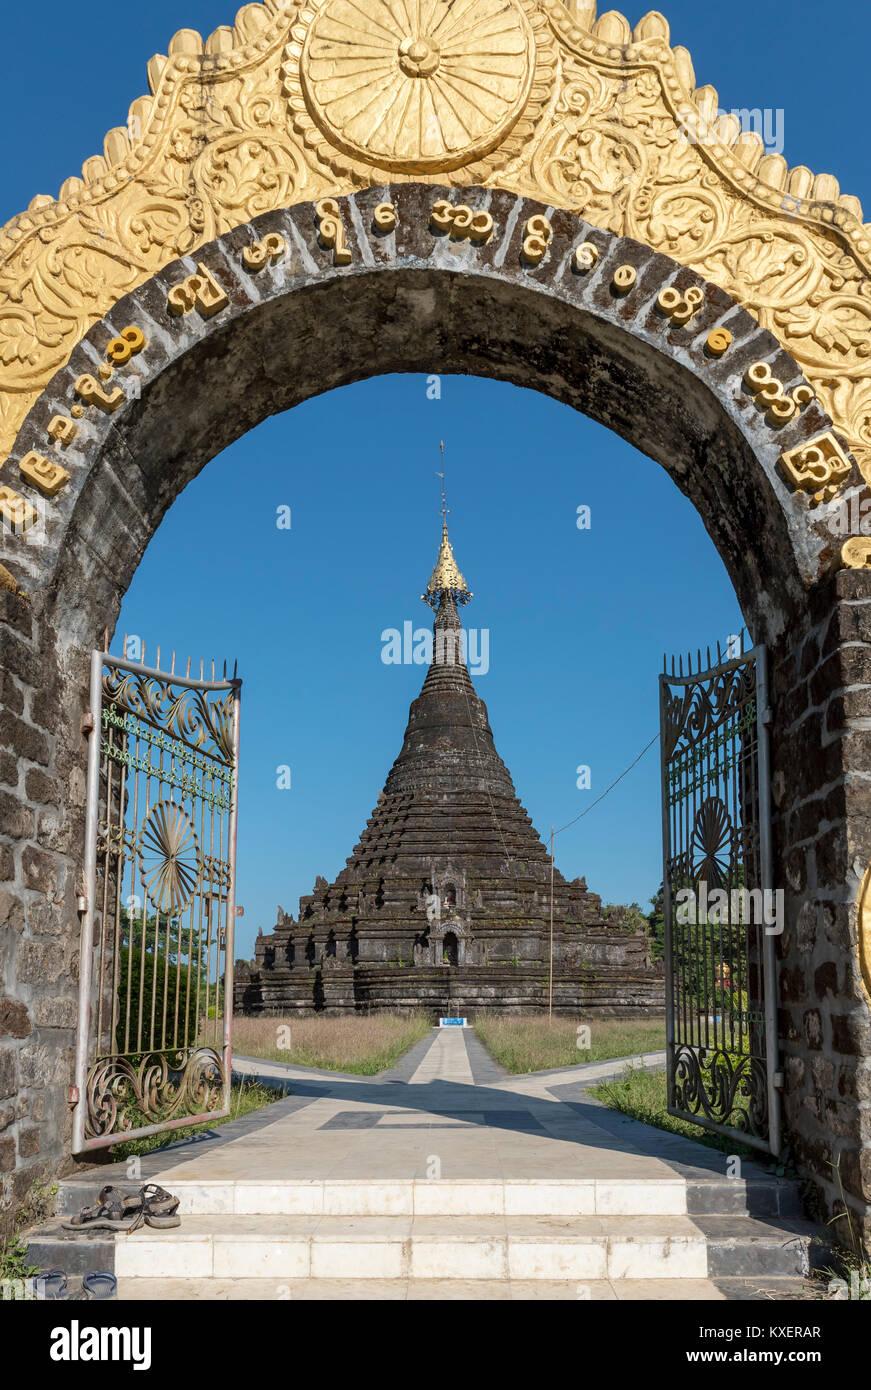 Sakya Man Aung Pagoda,Sakyamanaung Paya,Mrauk U,Burma,Myanmar - Stock Image